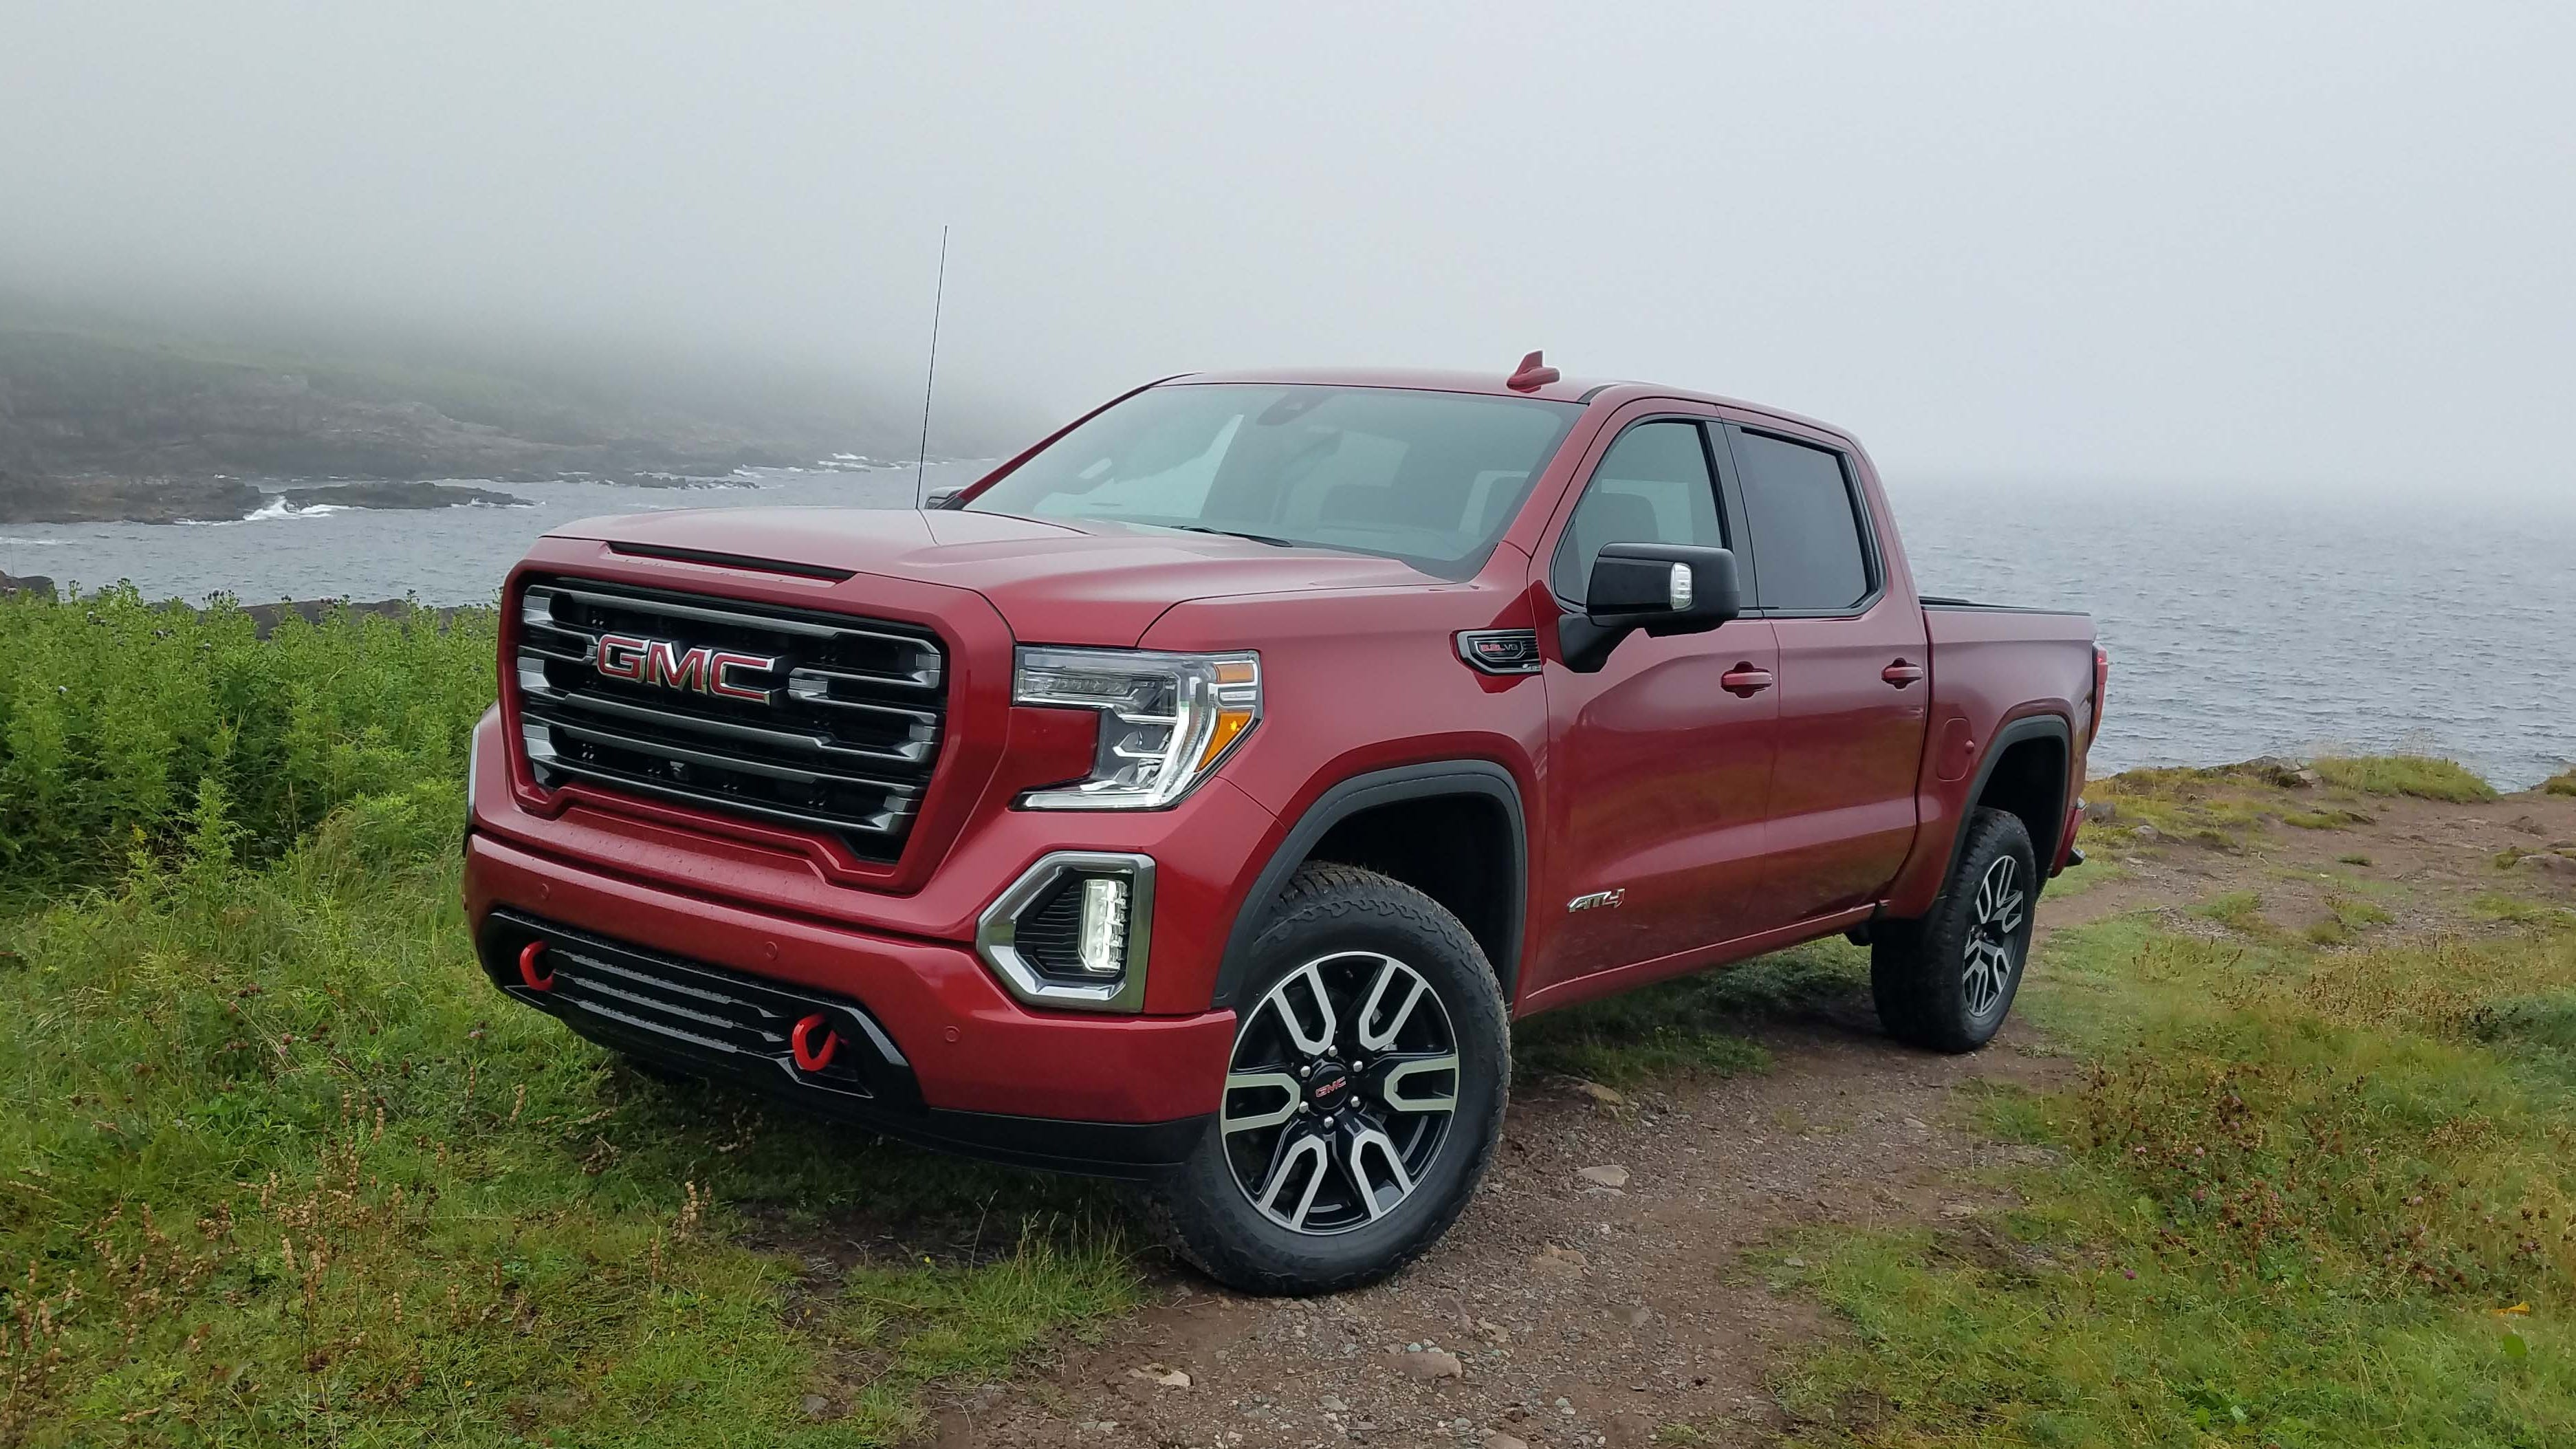 GMC Sierra pickup moves uptown